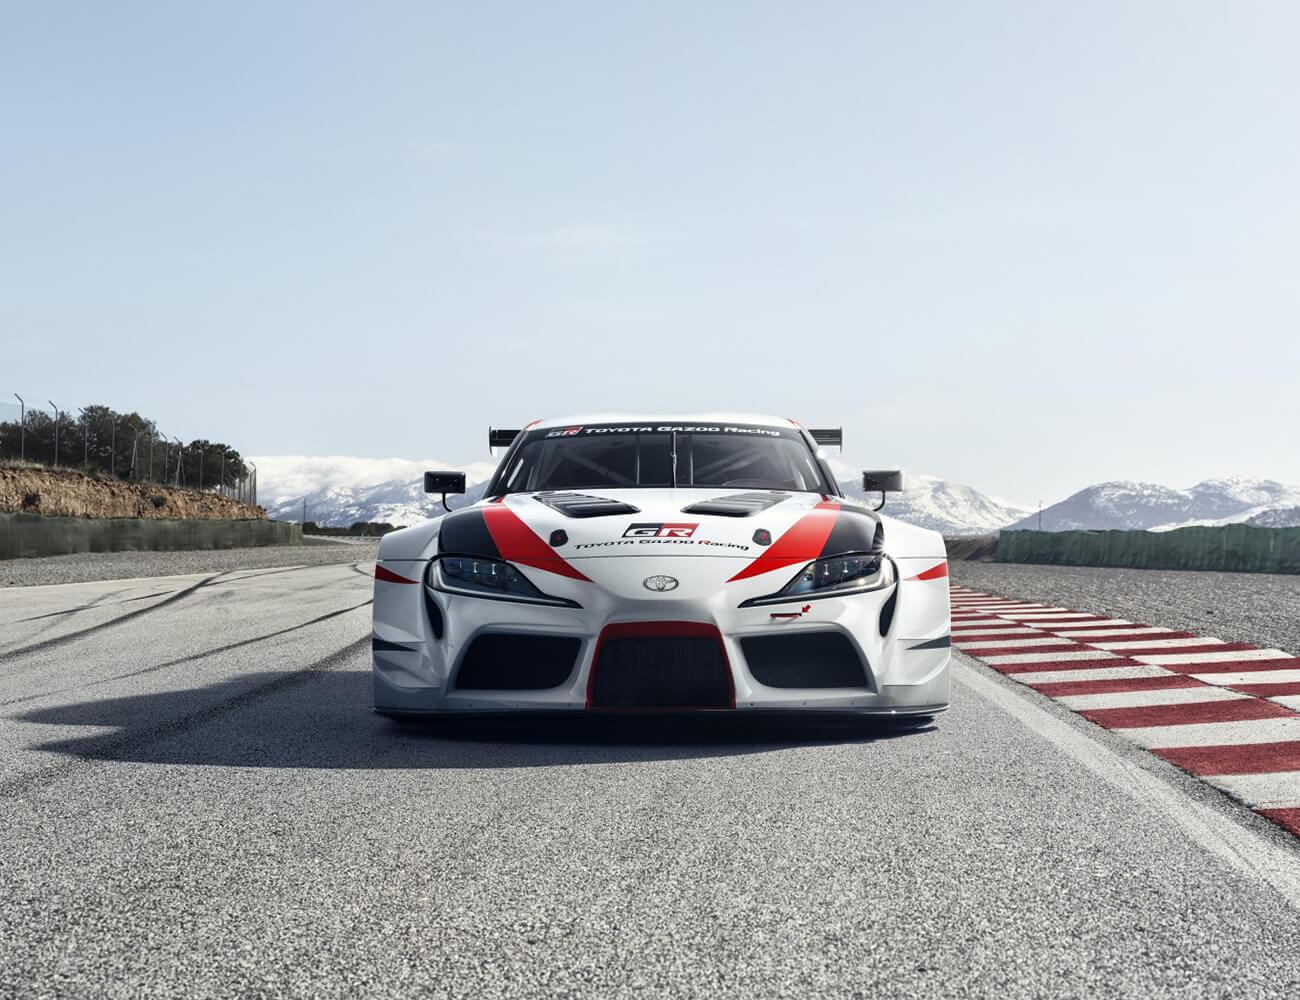 Ferrari vs Lamborghini on Road Test By Manufacturer